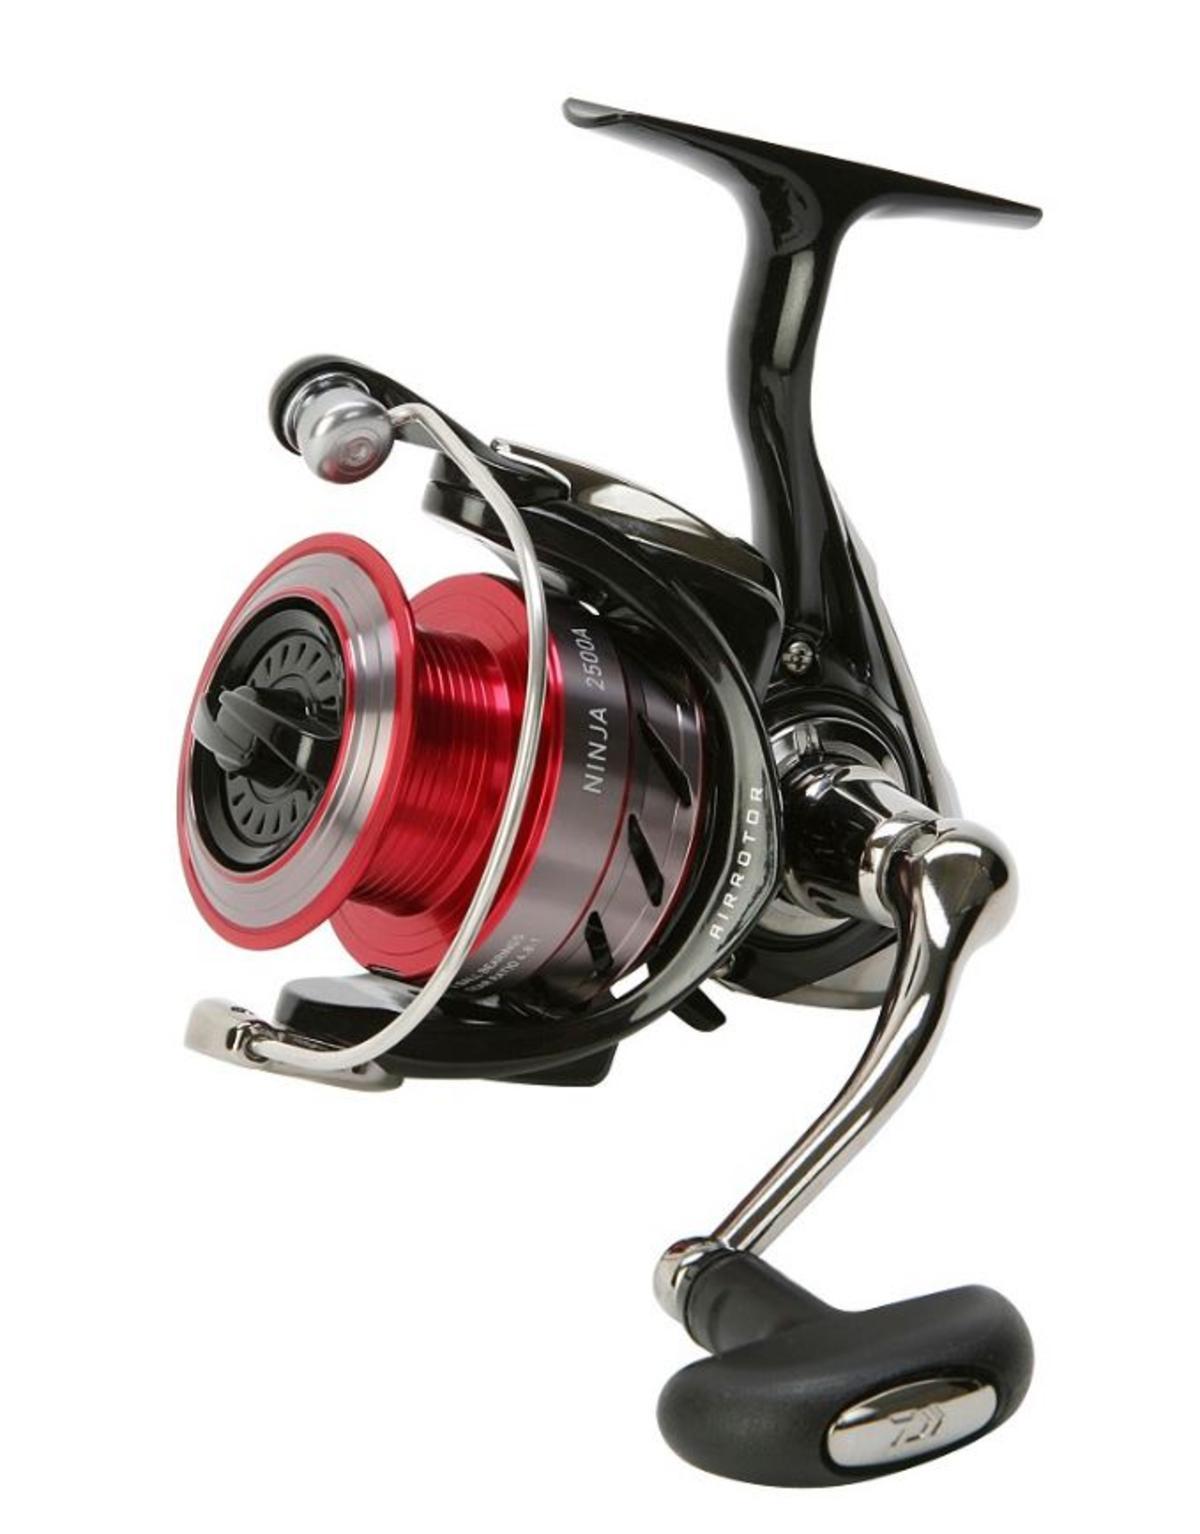 New Daiwa Ninja Spinning Fishing Reel - All Models